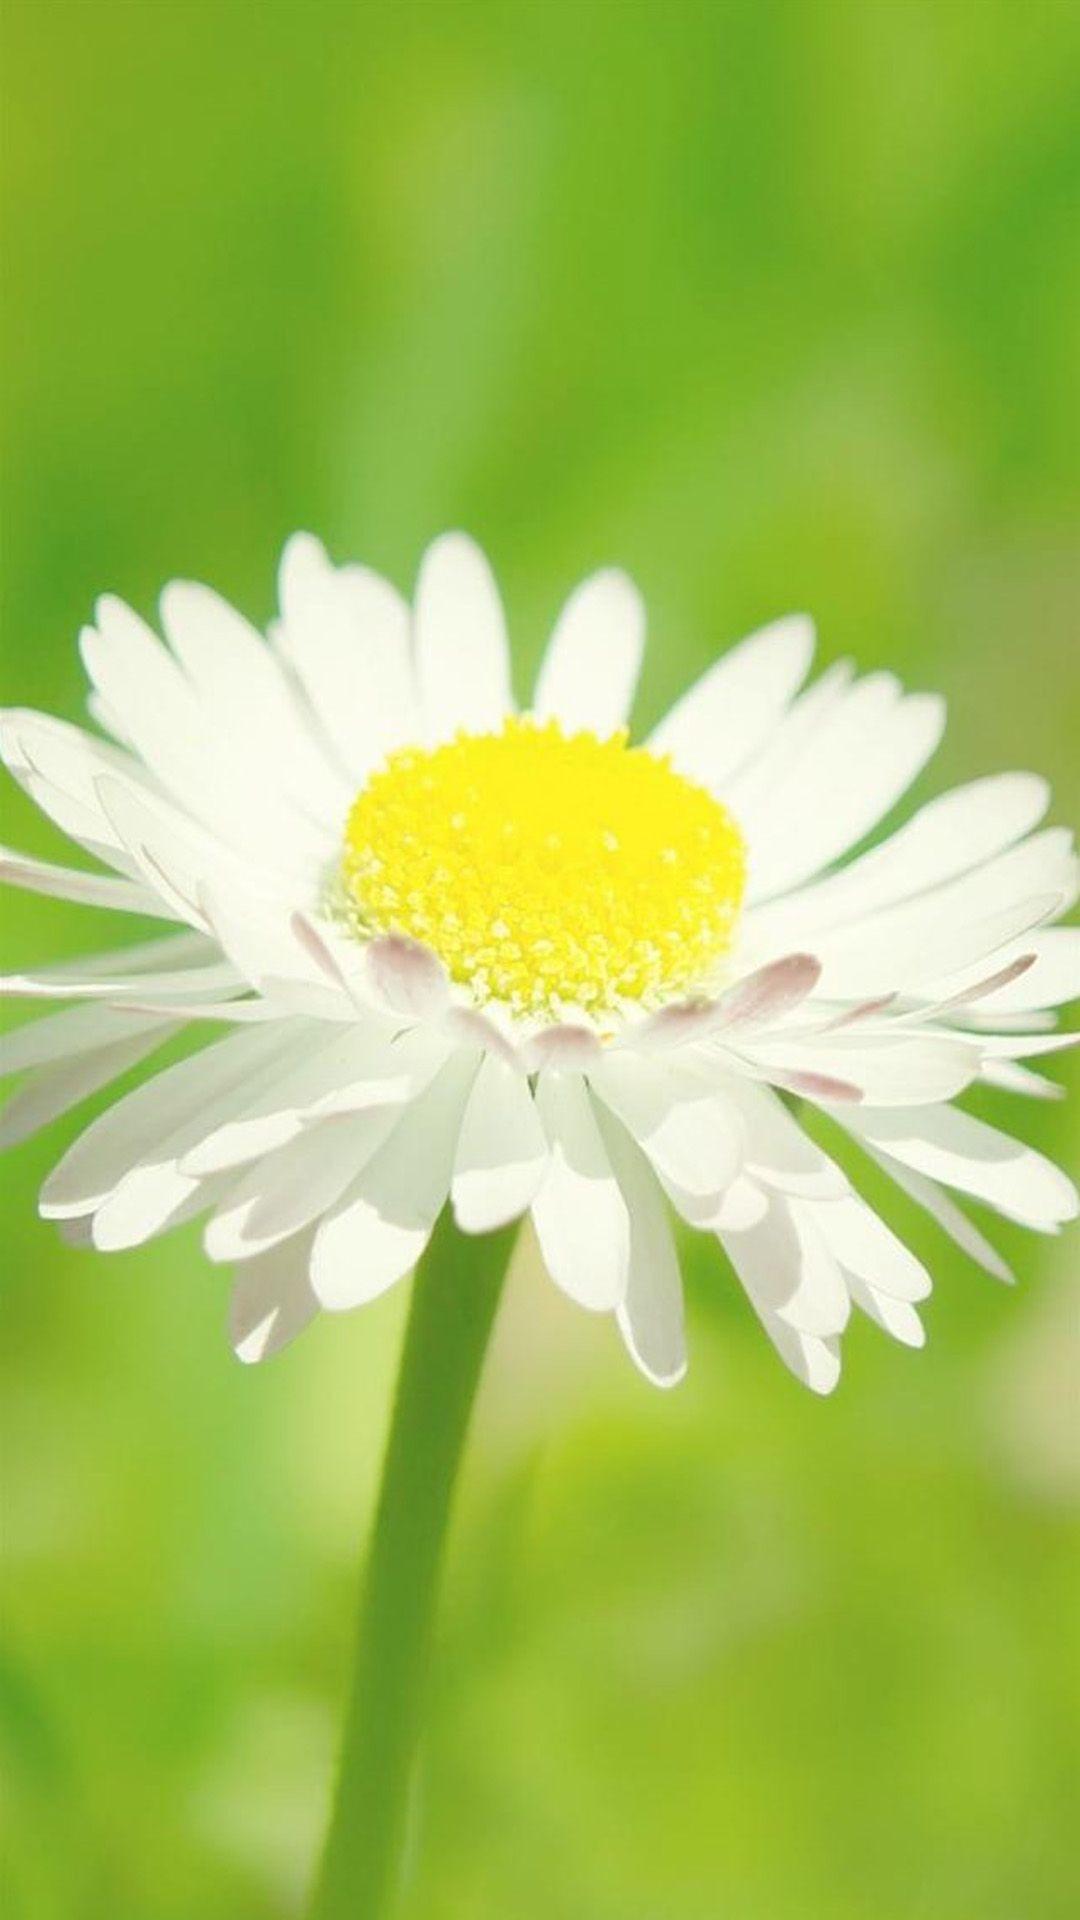 Sunny Daisy Flower Macro iPhone 6 plus wallpaper